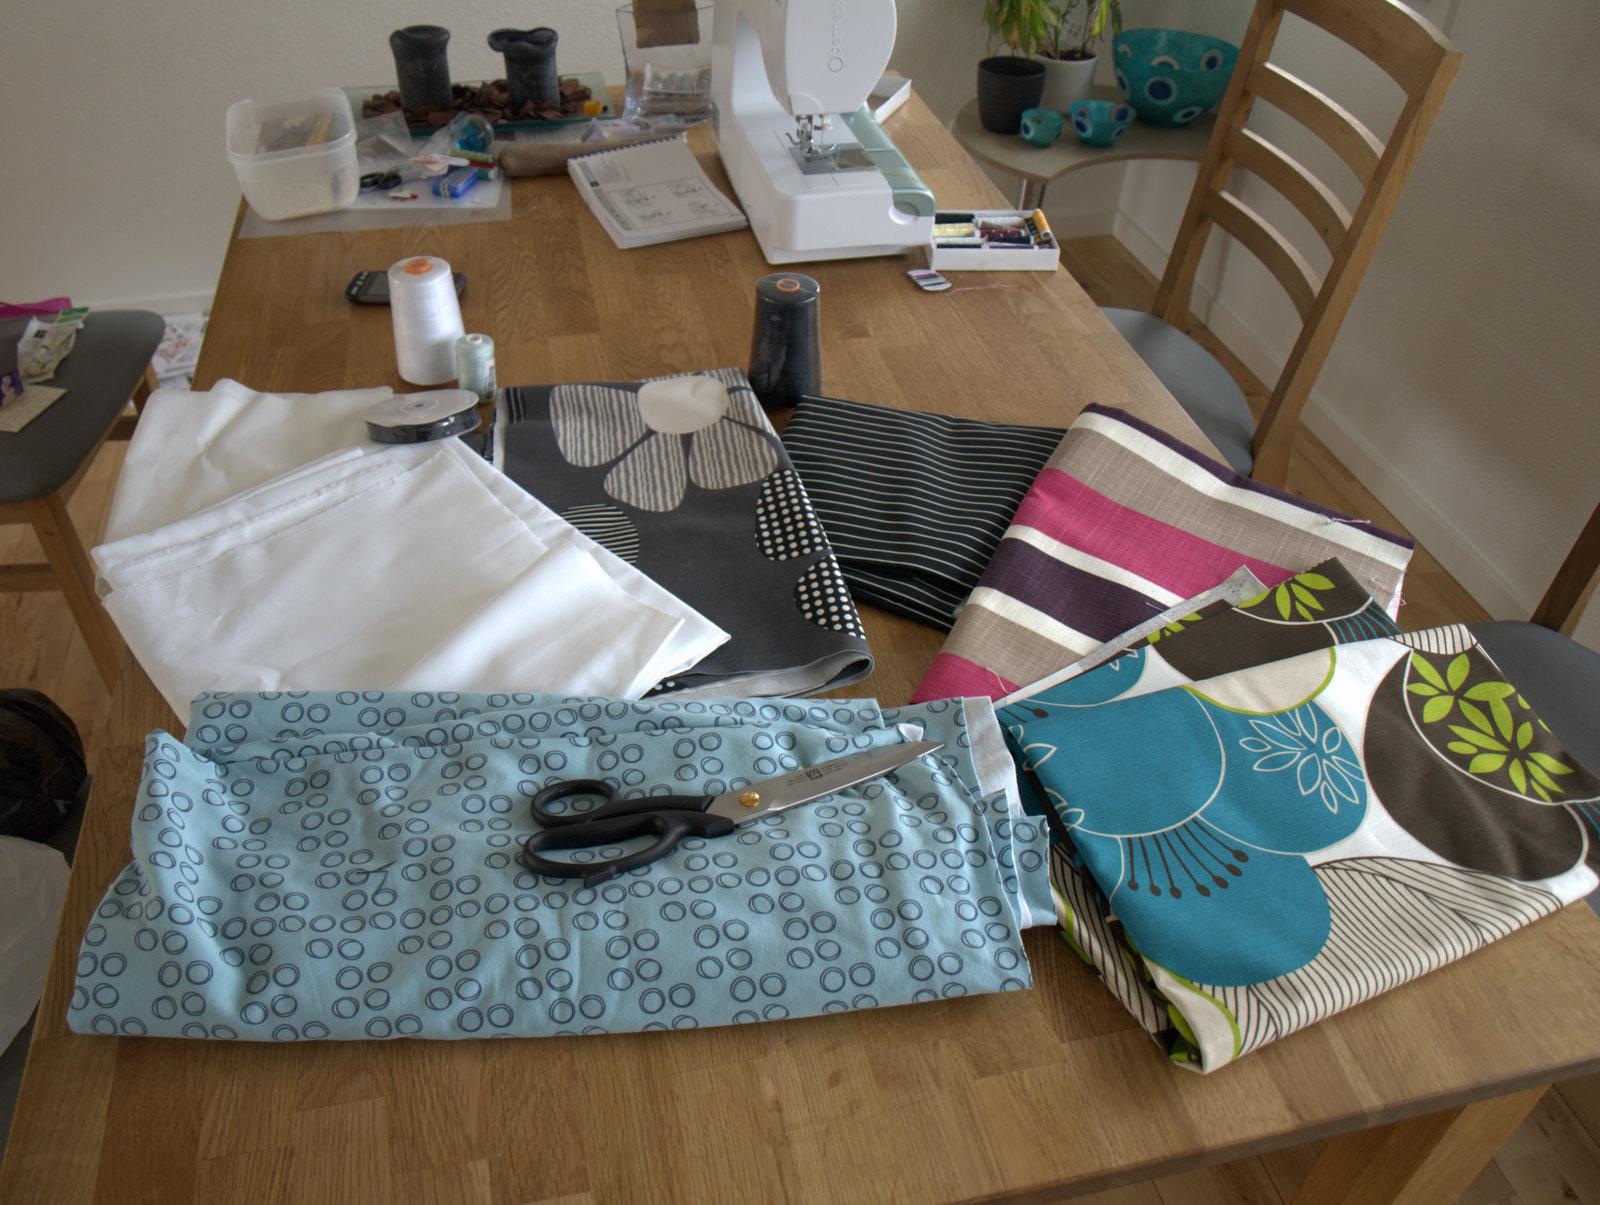 Masser af stof fra Stof og stil - min nye Zwilling-saks som jeg bestilte på nettet i går.